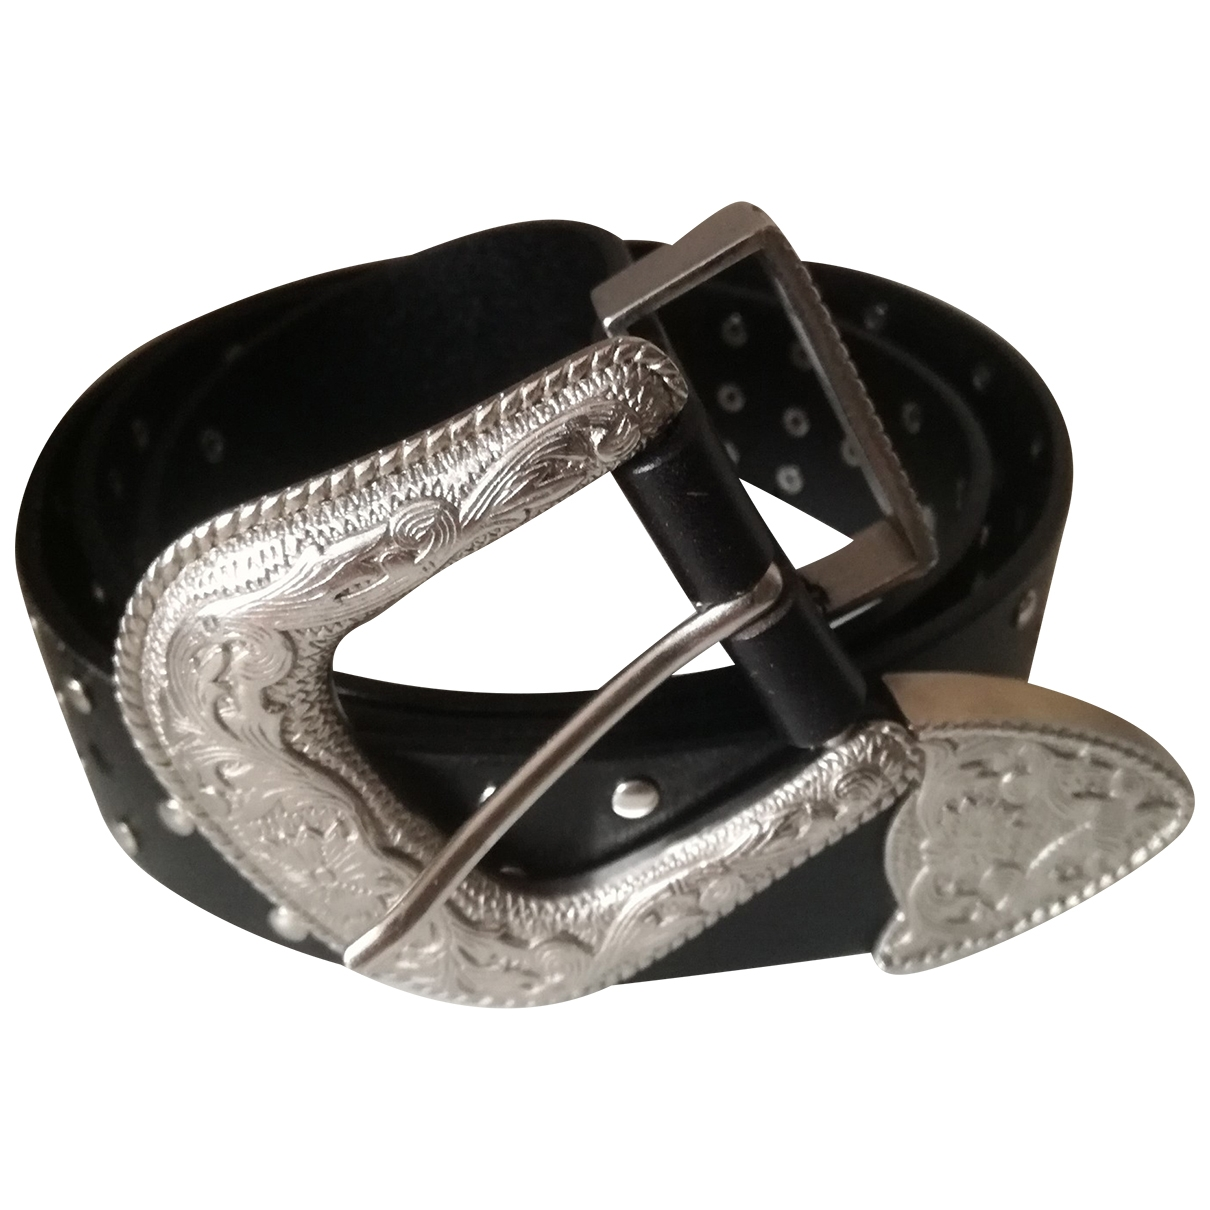 Cinturon de Cuero H&m Studio